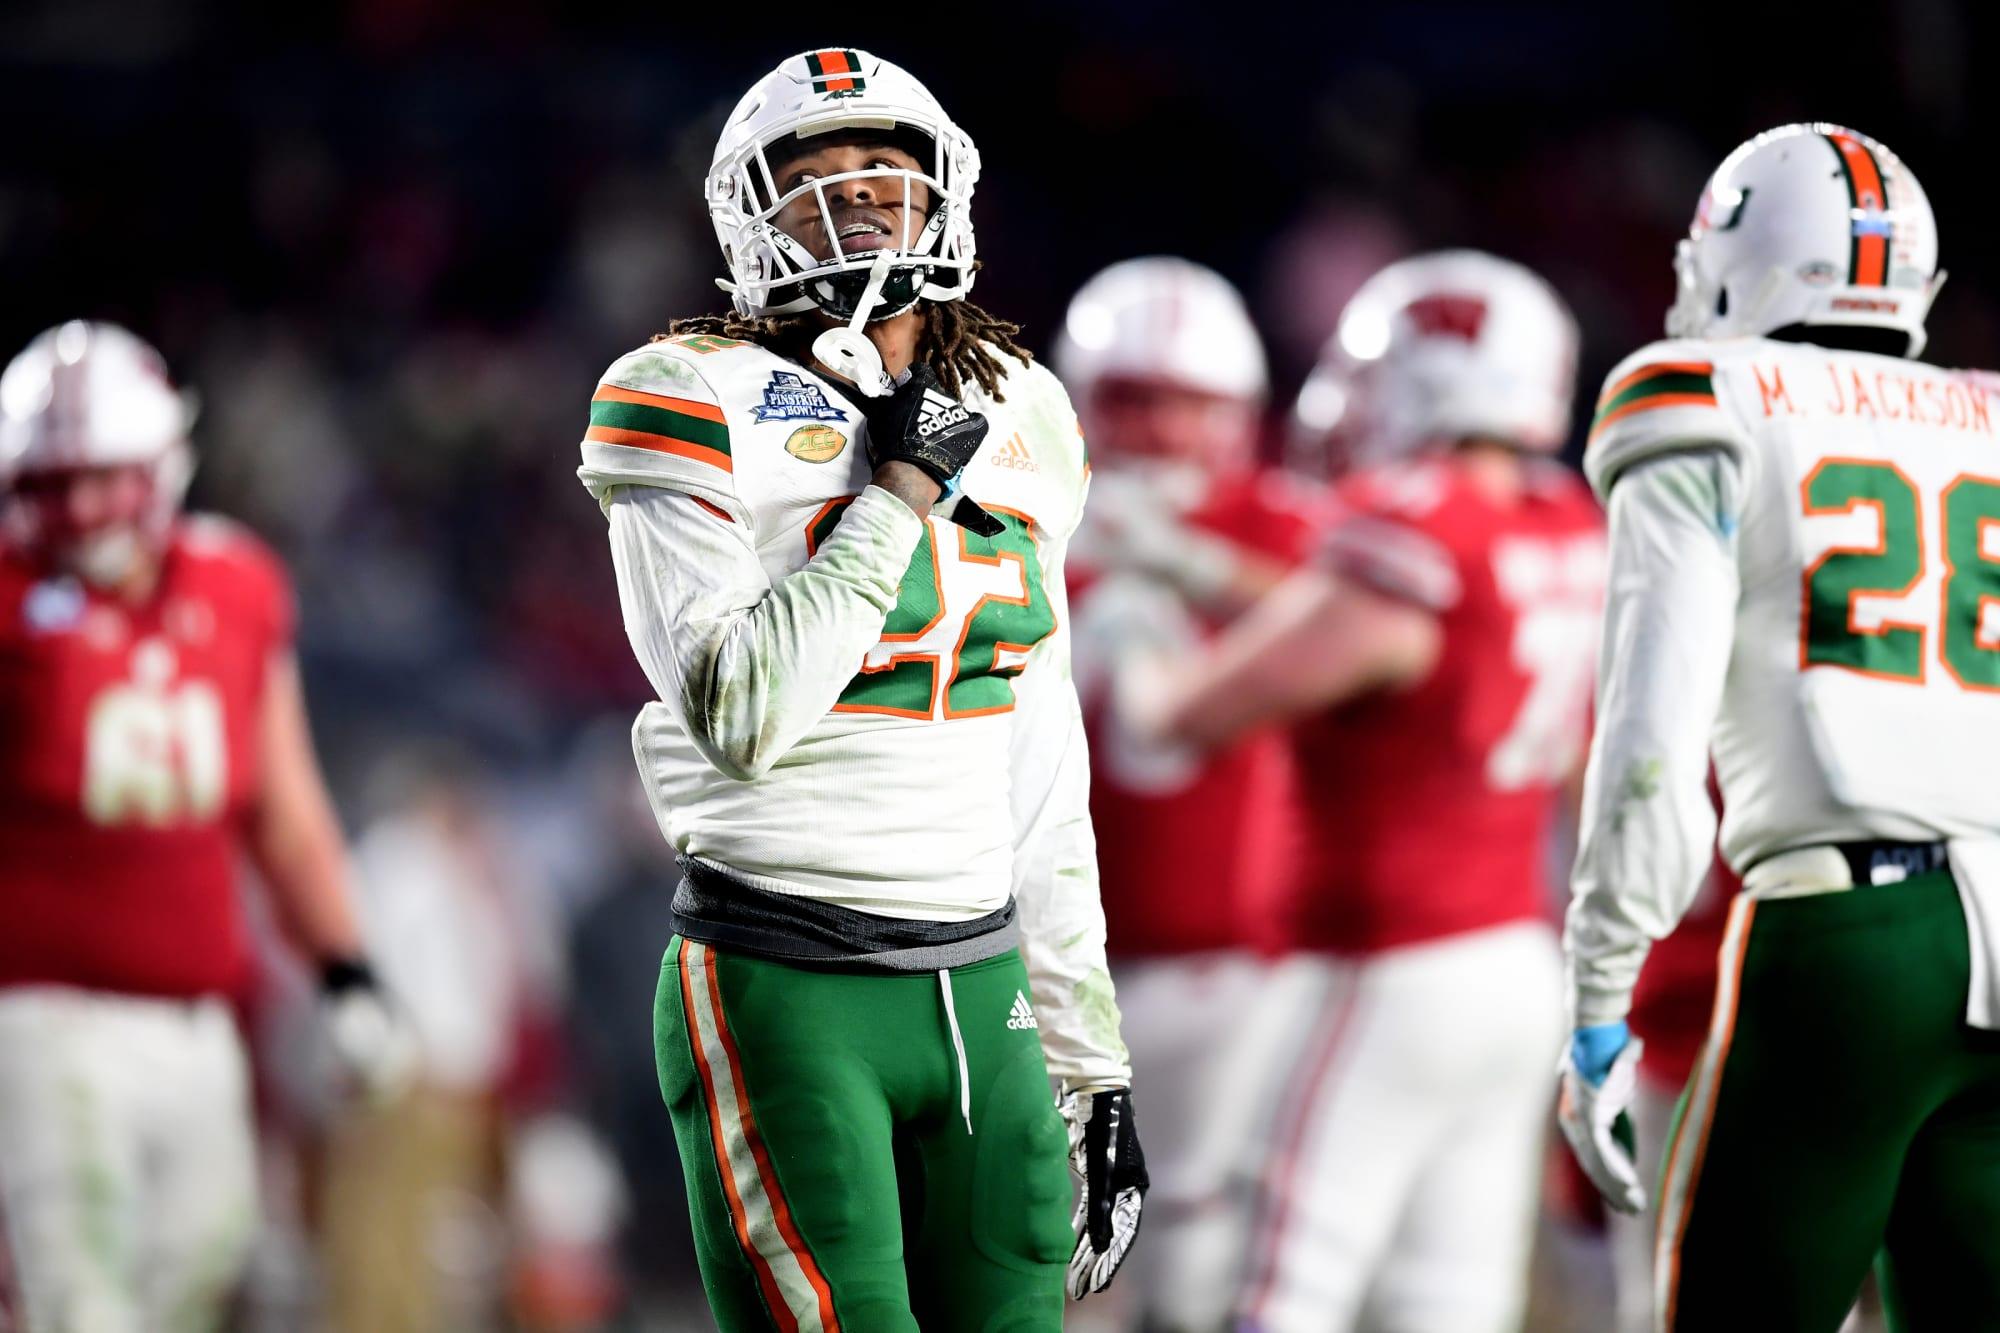 Miami football has struggled versus Big 10 since 2003 Fiesta Bowl